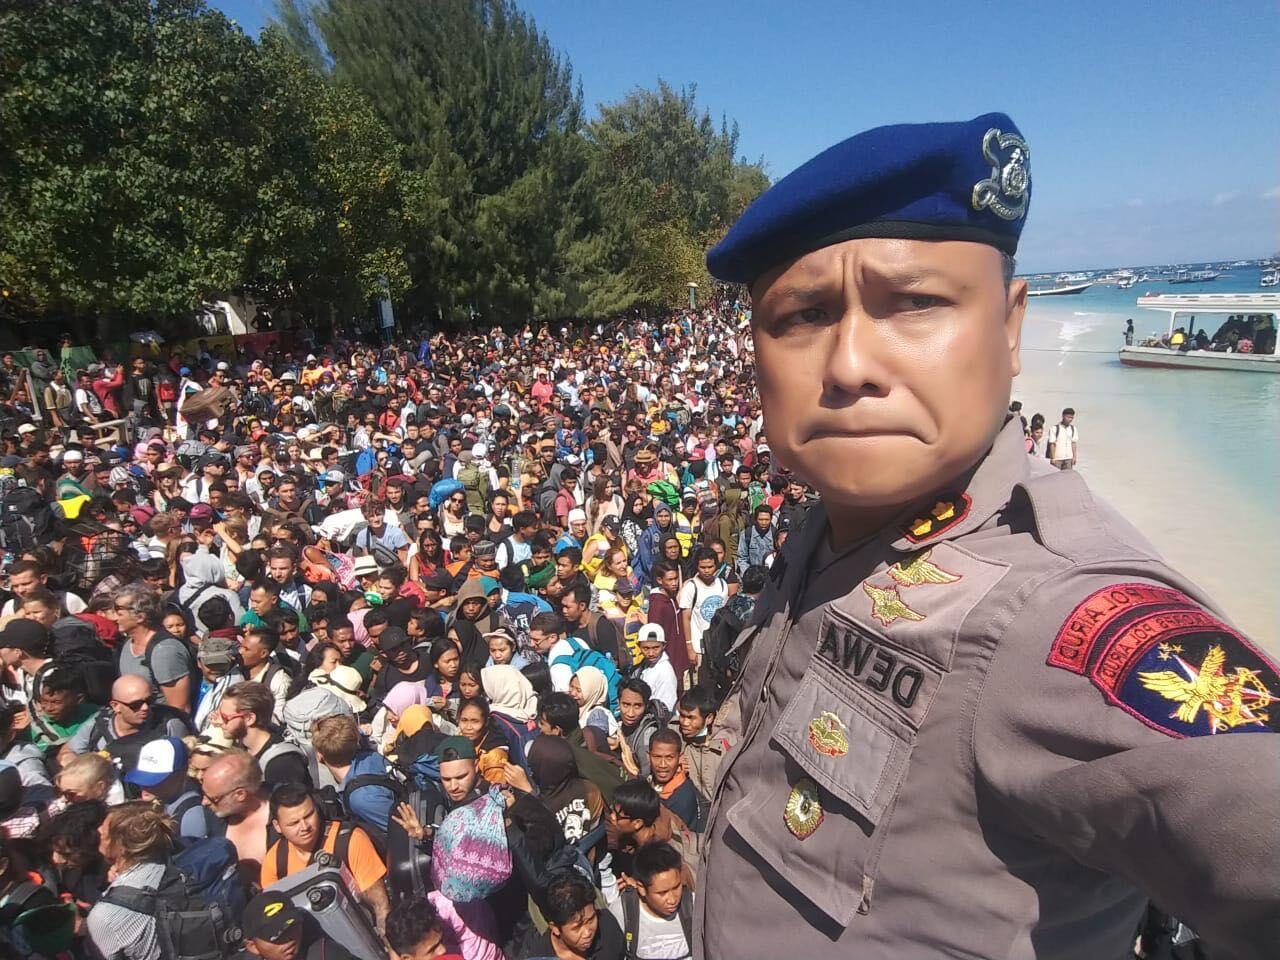 Ini 5 Fakta Unik Gempa Lombok yang Diduga Doublet Alias Kembar